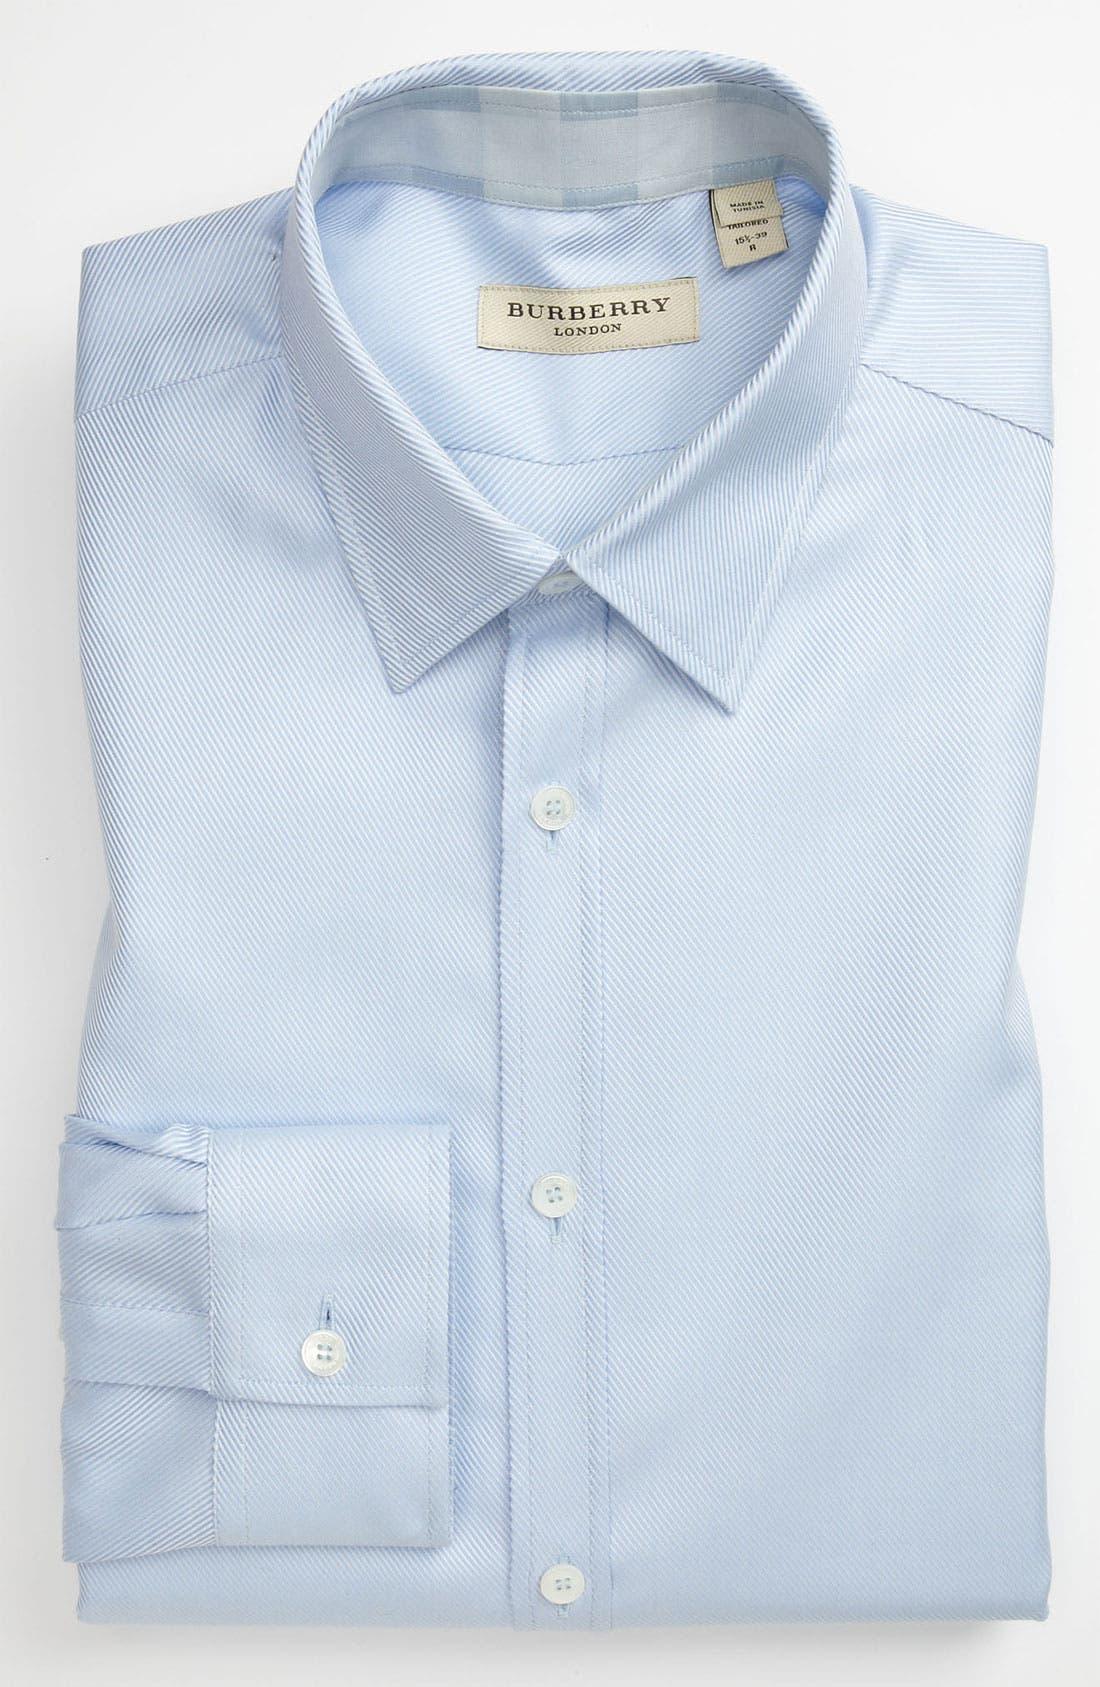 Main Image - Burberry London Tailored Fit Dress Shirt